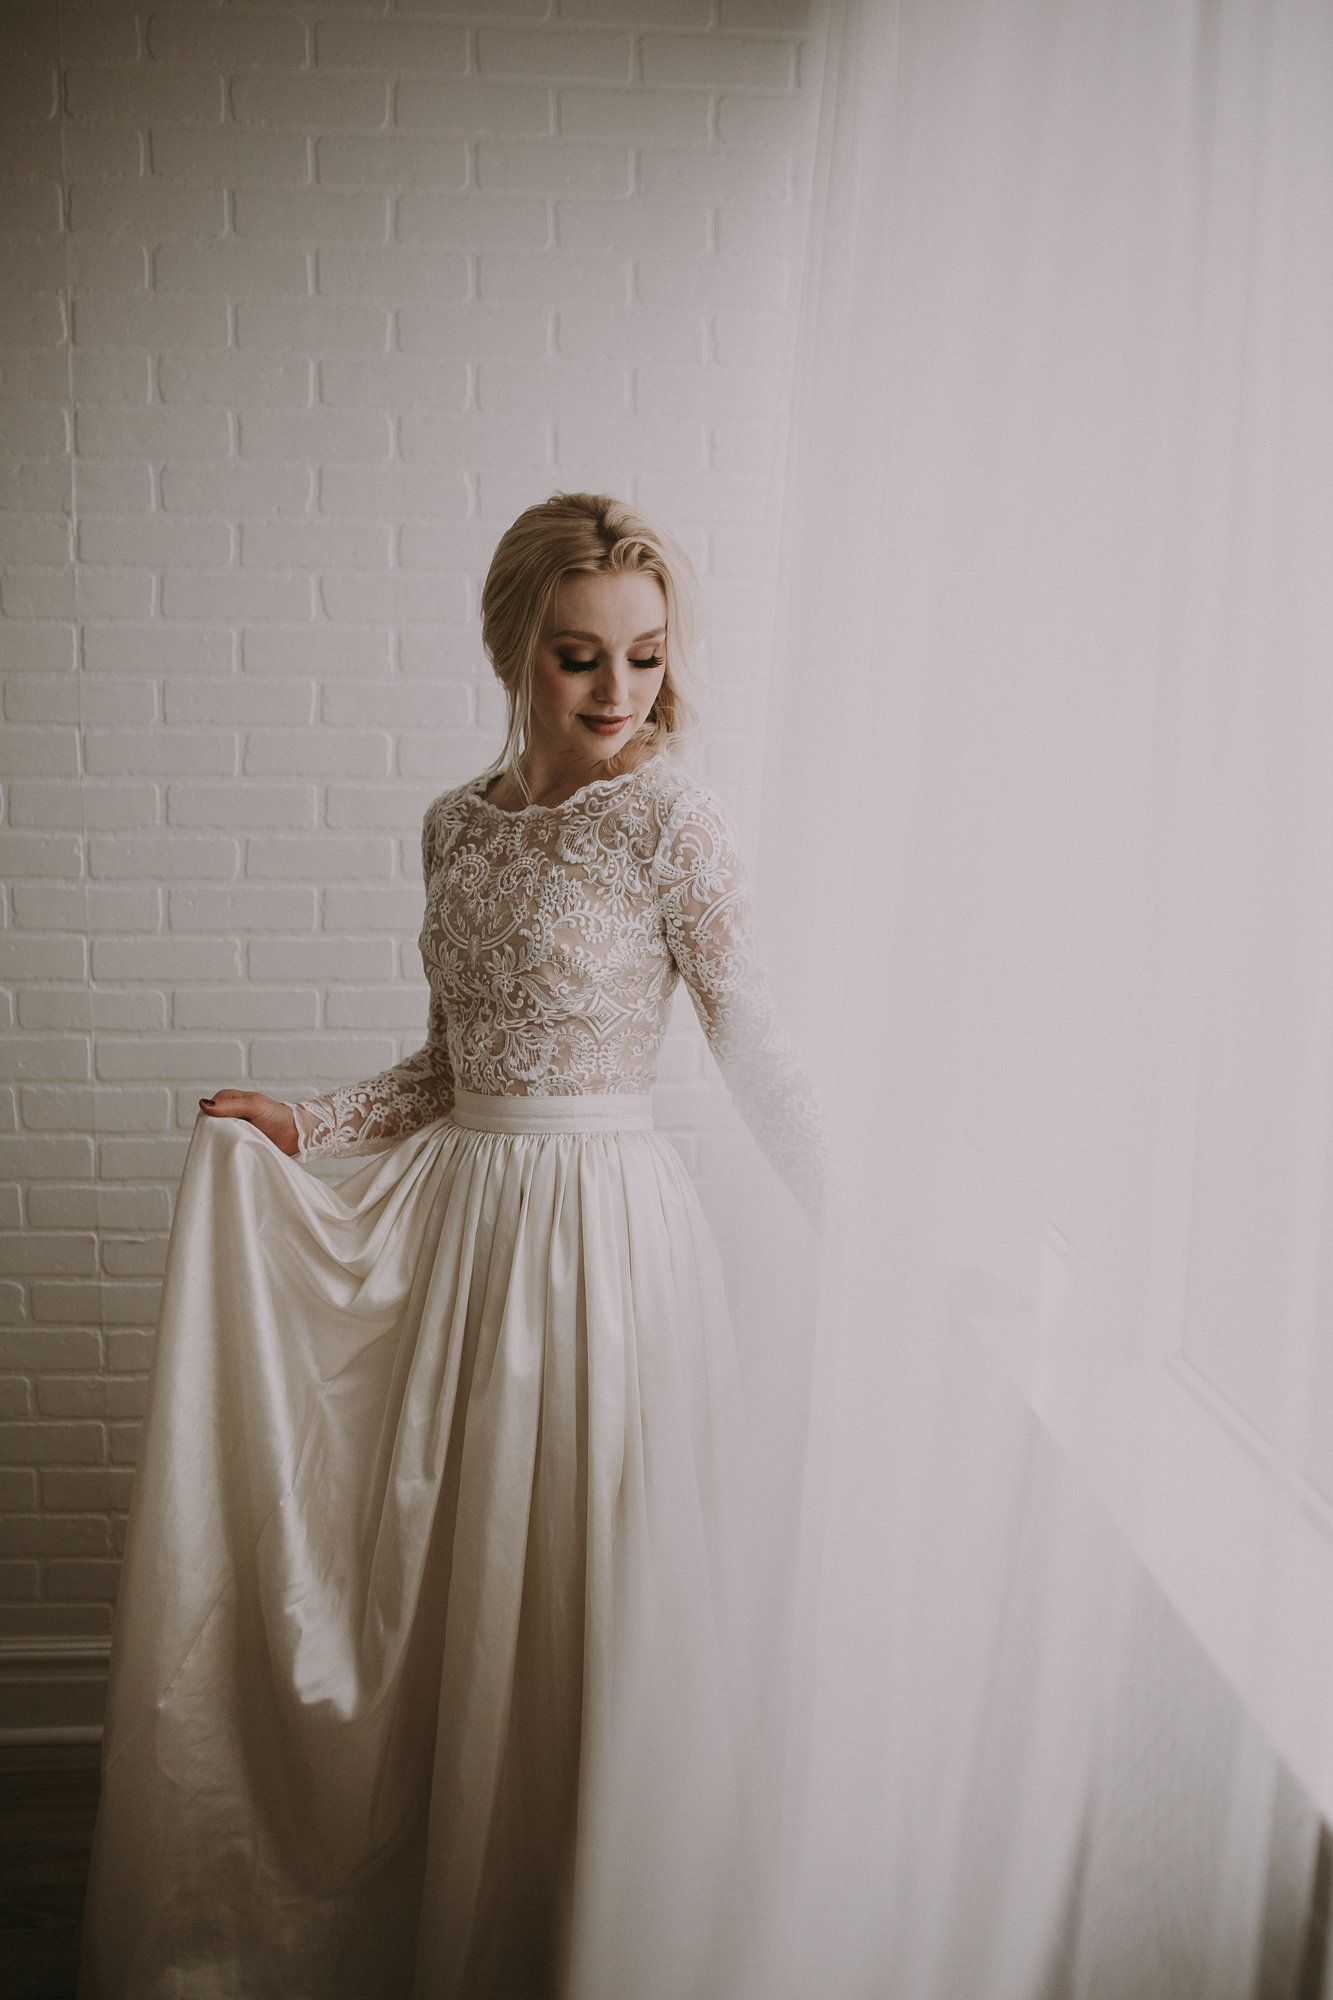 Wear your wedding dress on your anniversary  Magnolia Skirt  Dream Wedding Ideas  Pinterest  Wedding dresses